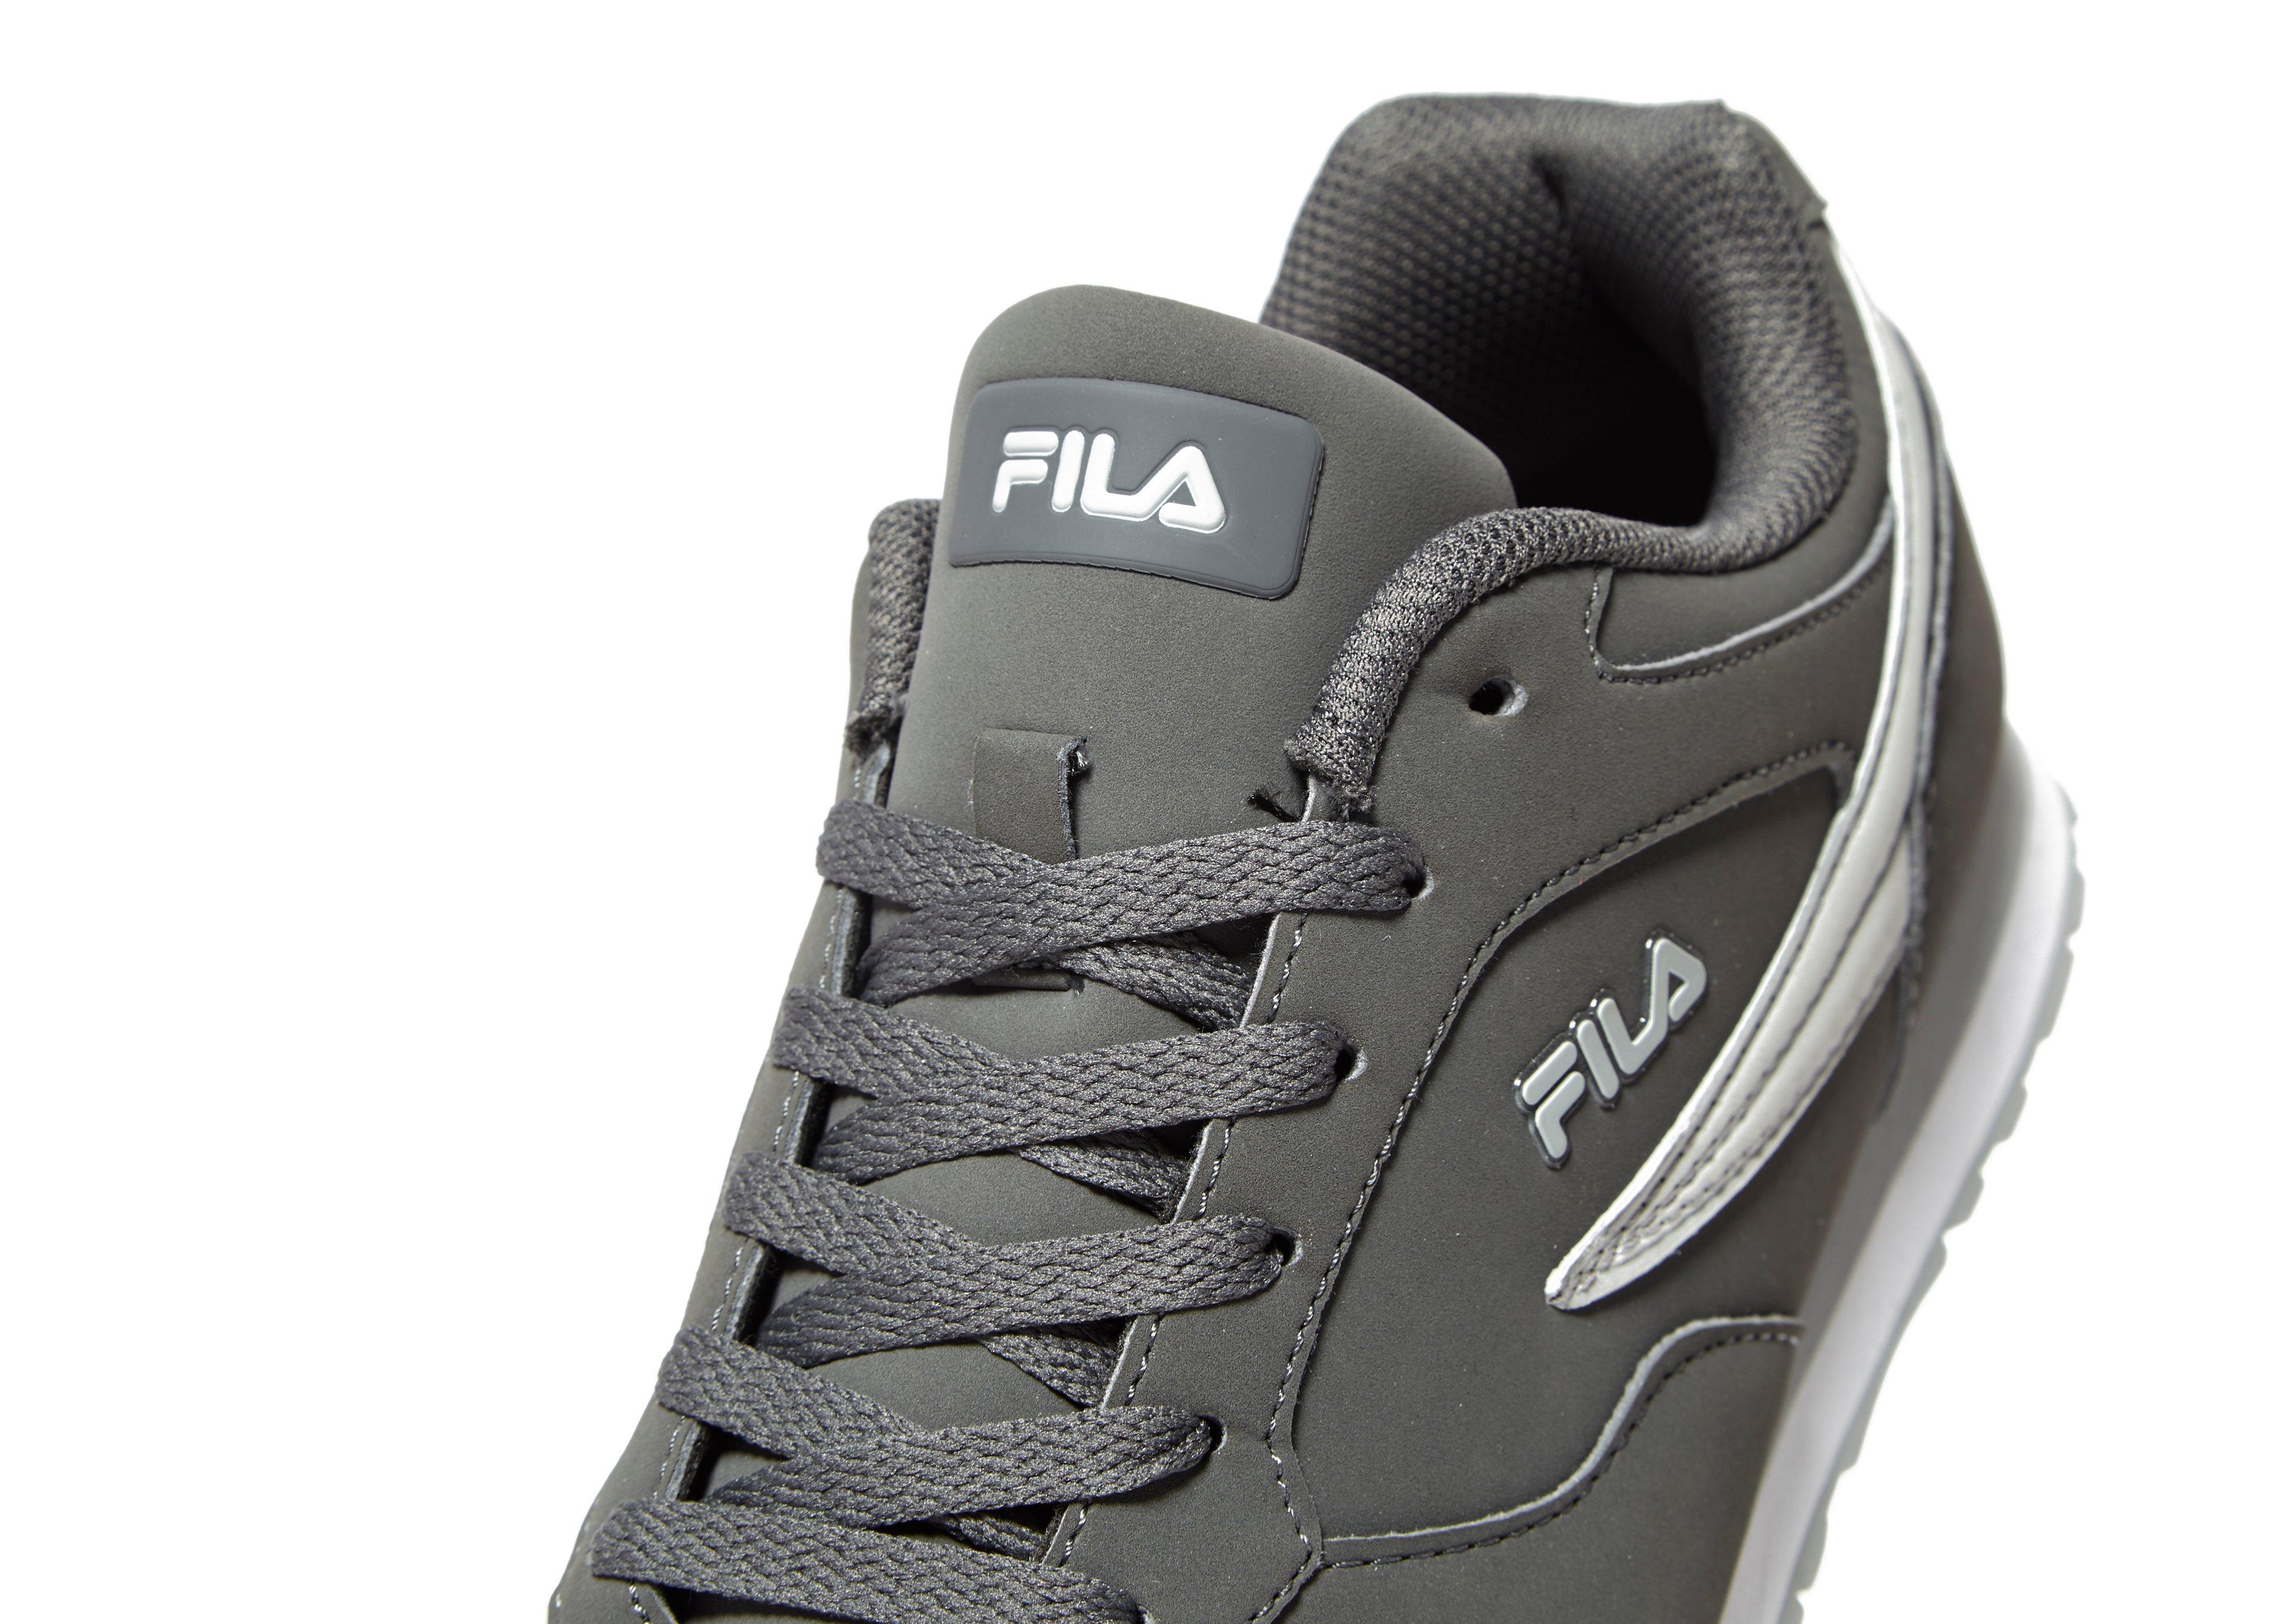 fila boots clásico